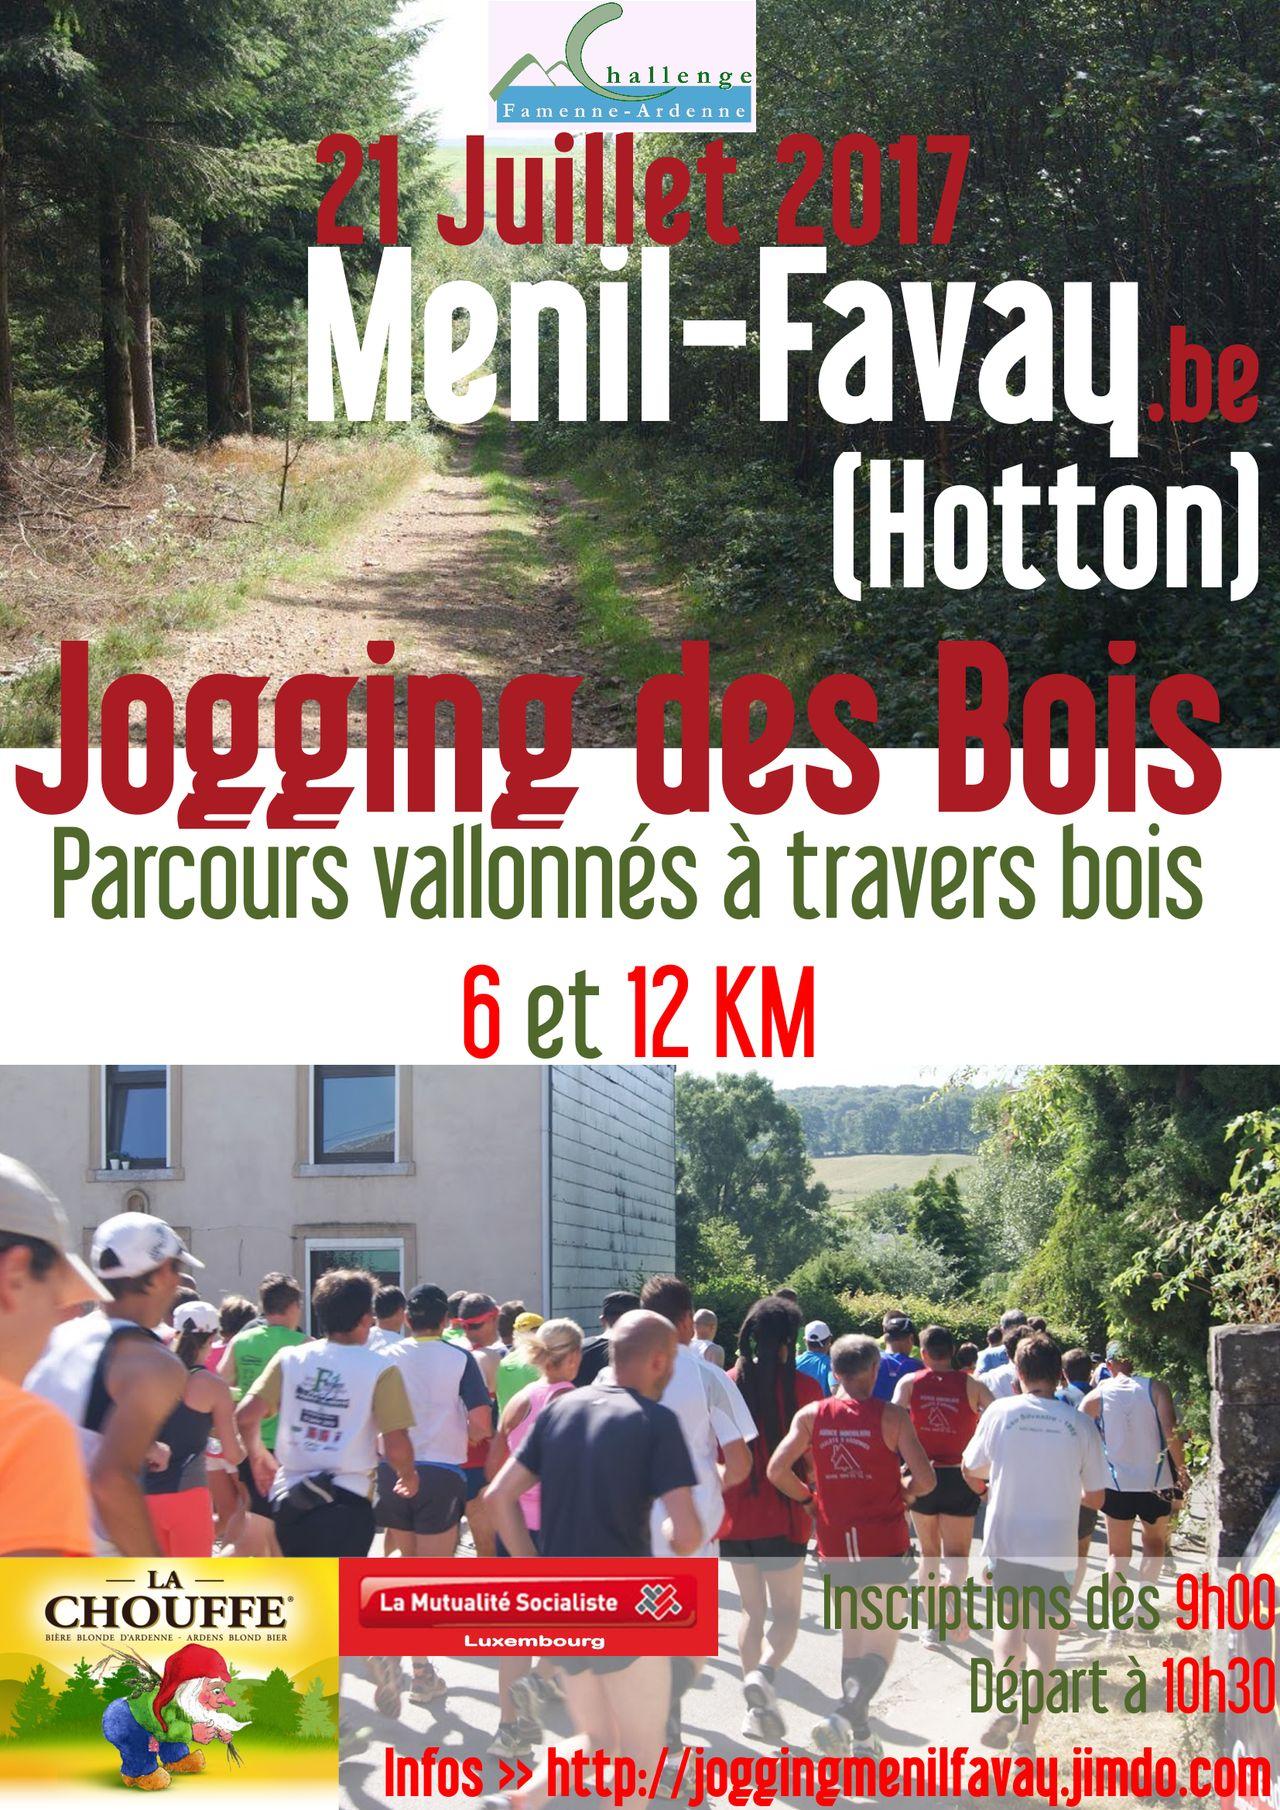 Affiche Jogging 21 juillet 2017 Menil